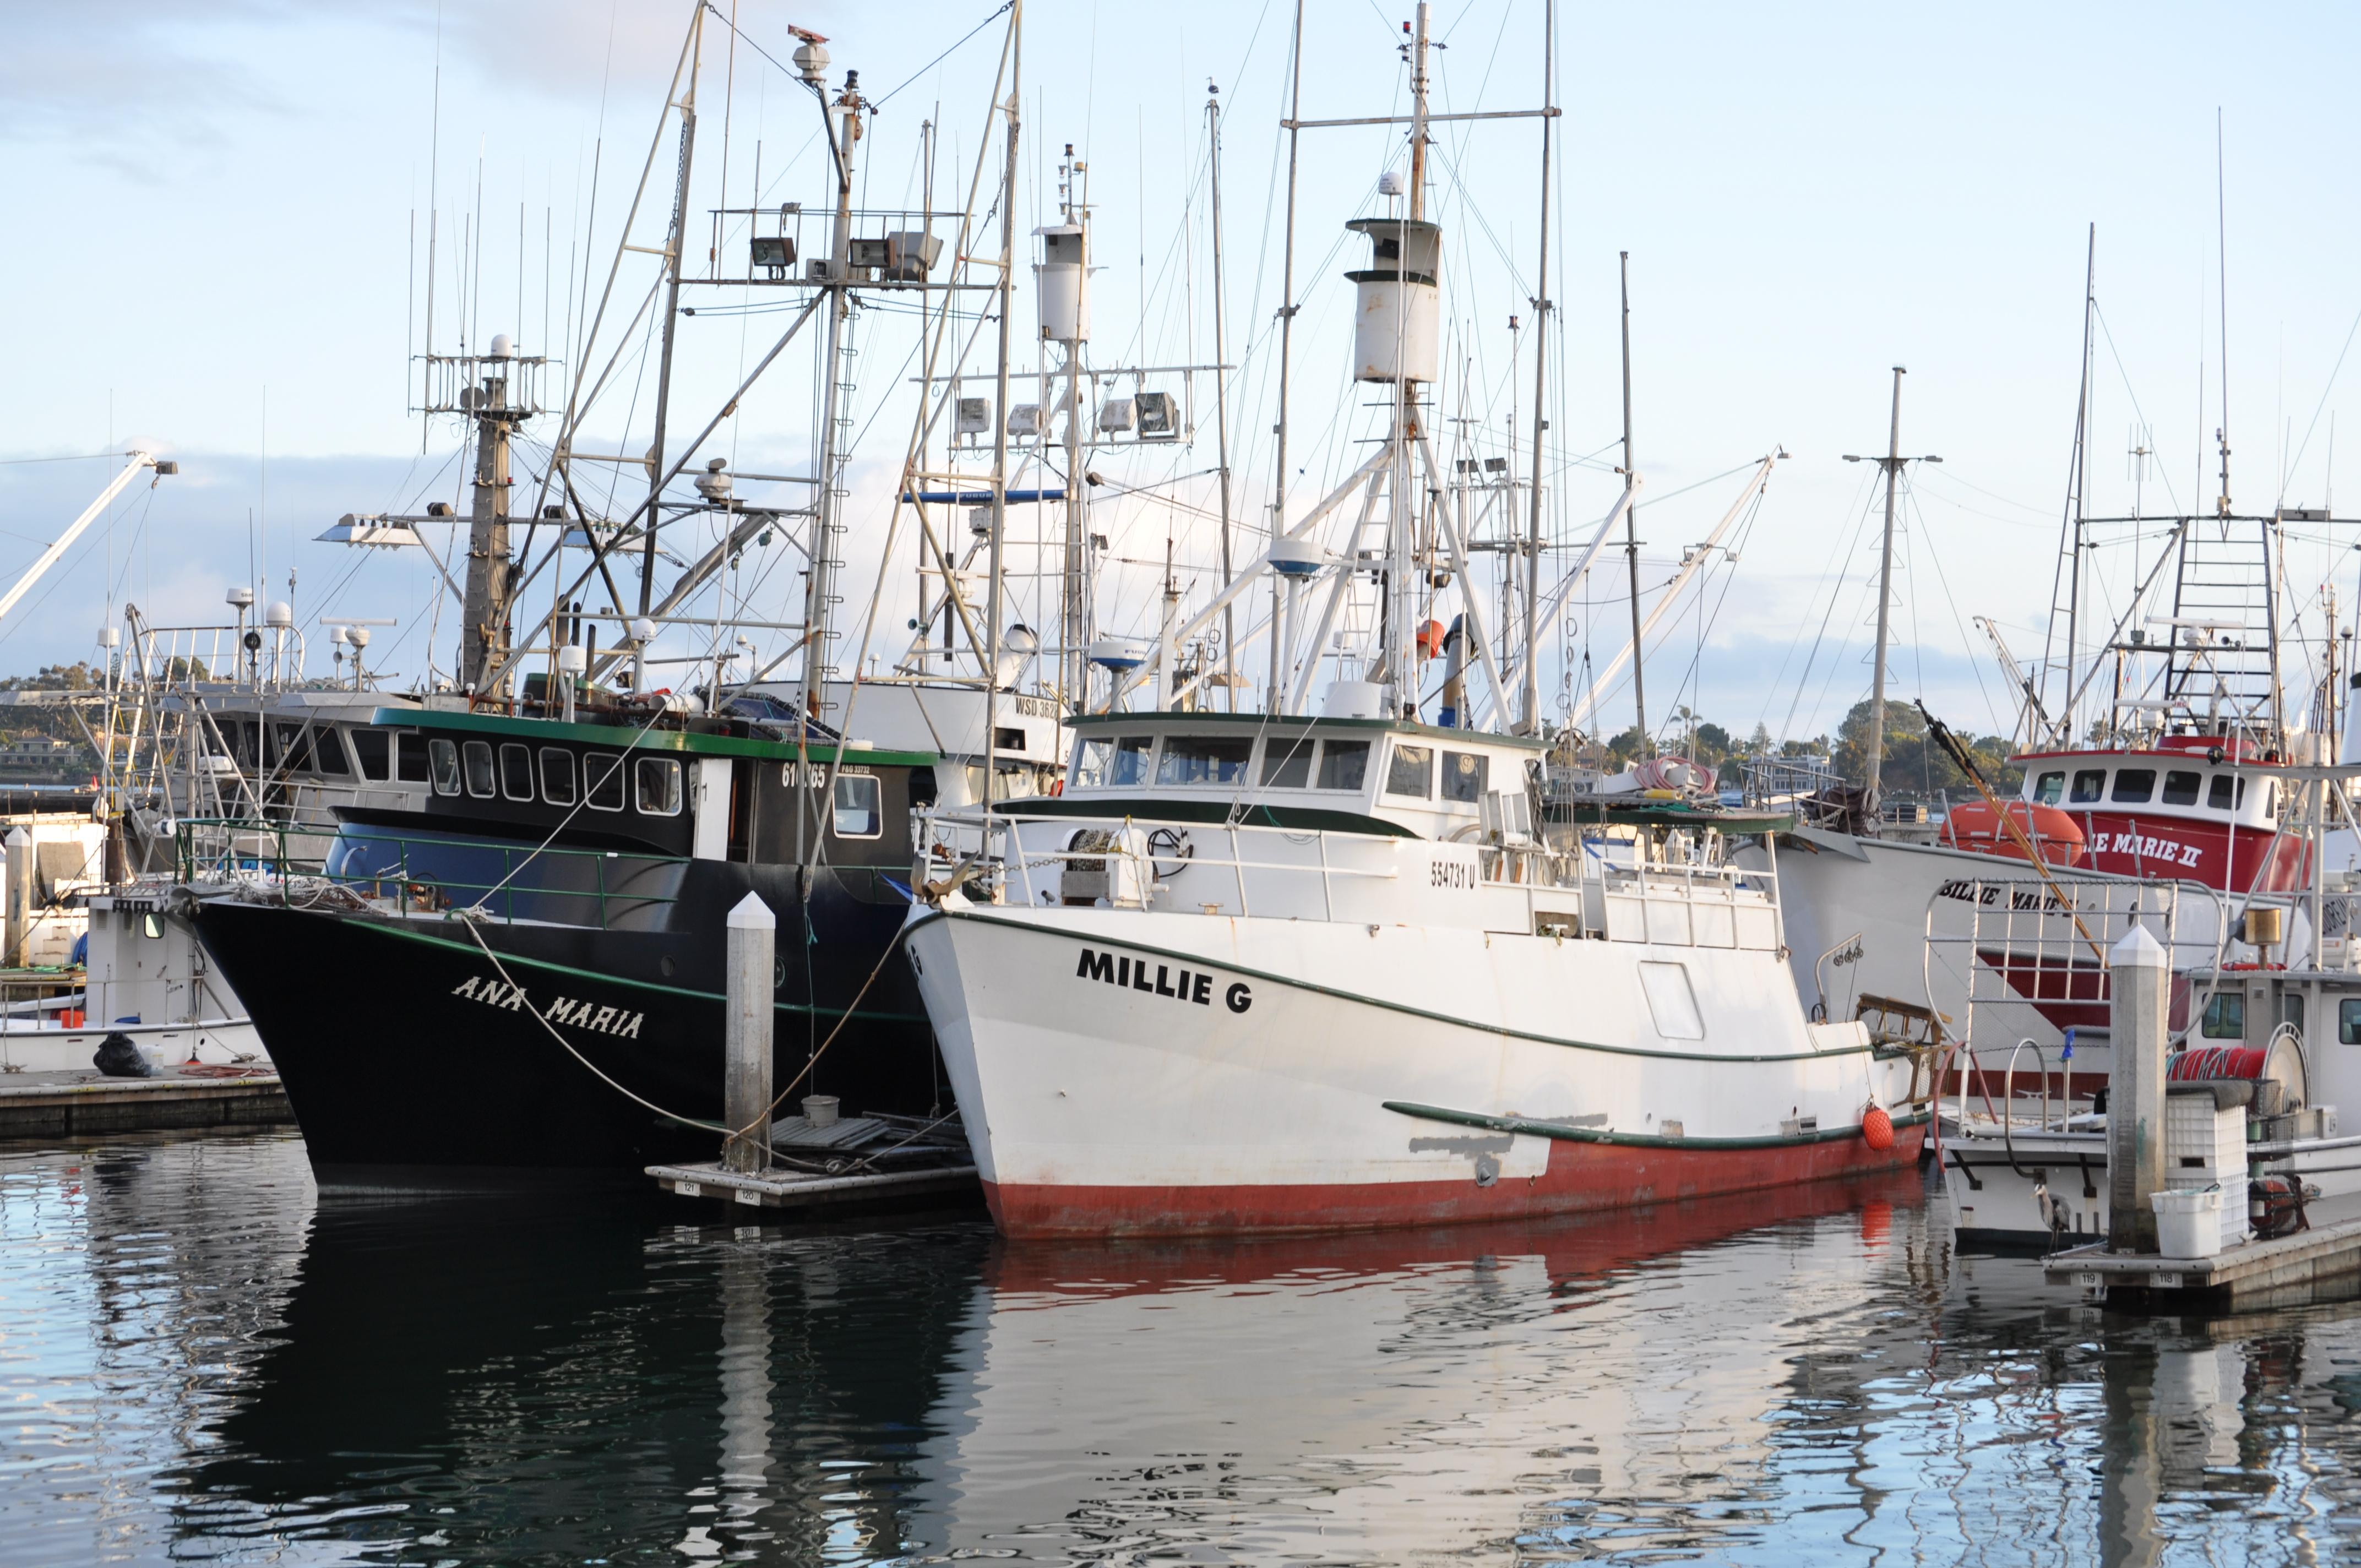 2012-04-26 - Balboa and Seaport Village 508